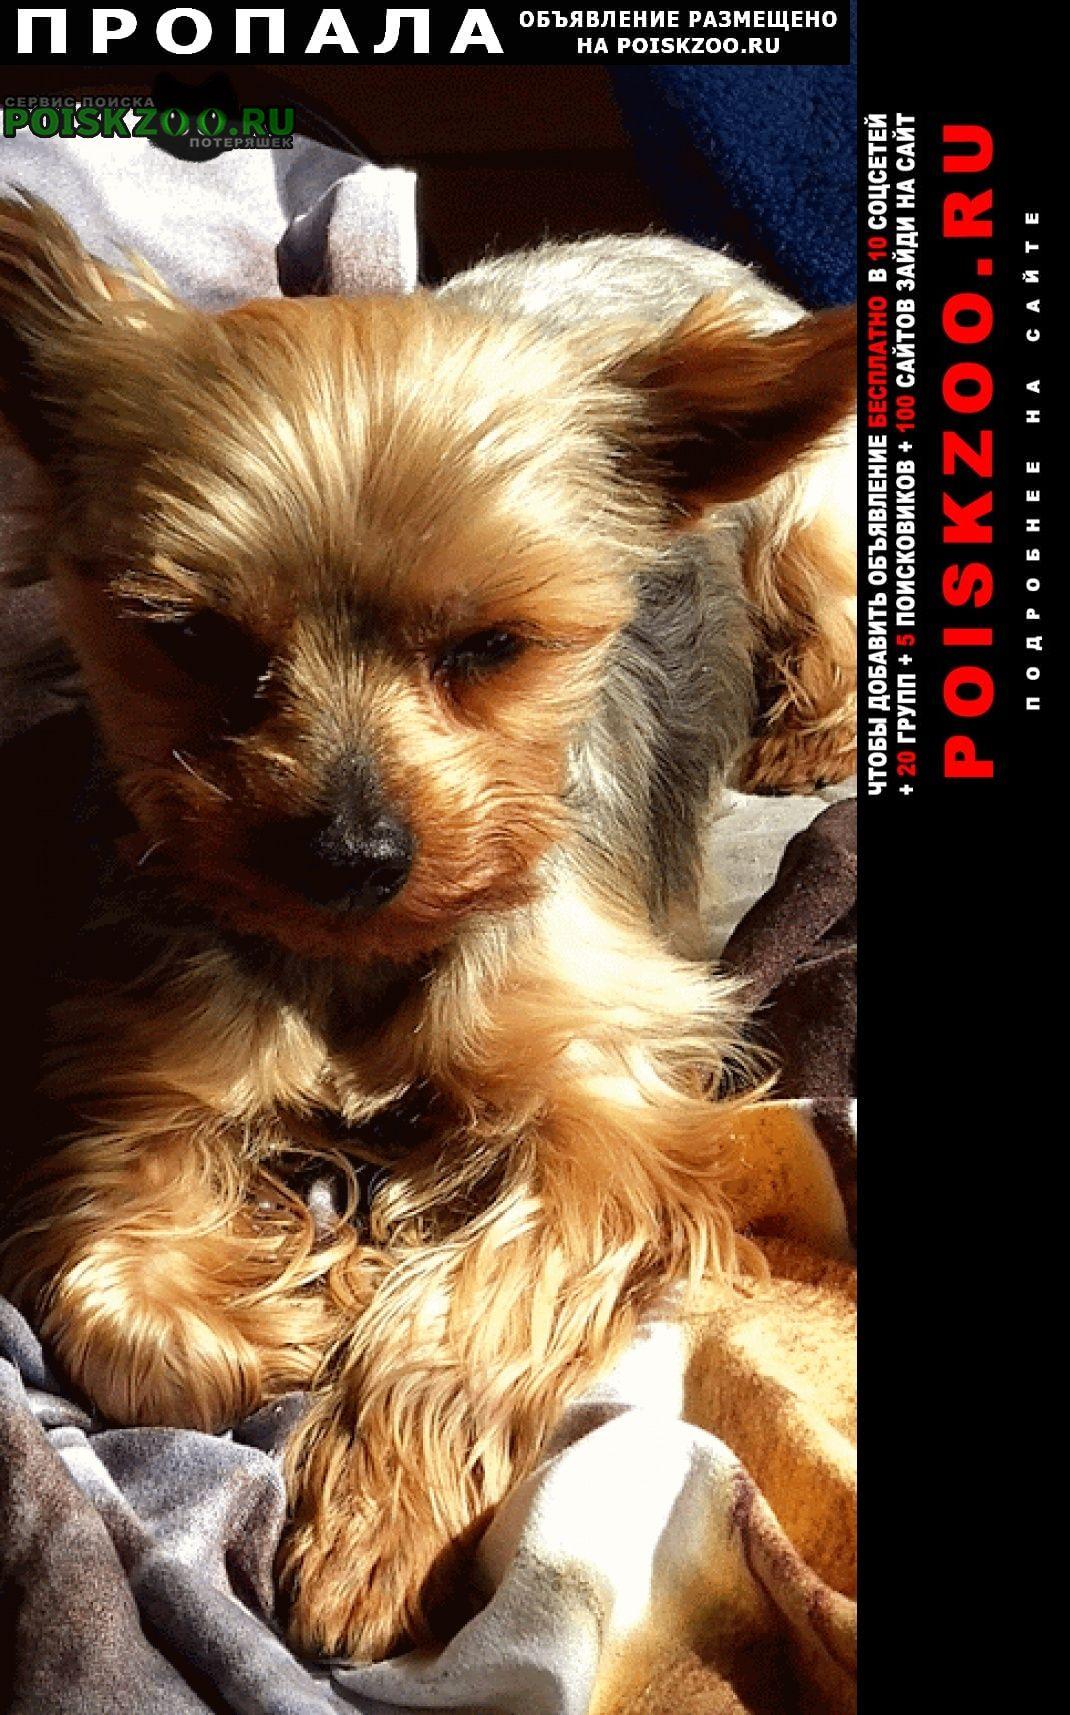 Пропала собака кобель йоркширский терьер Одинцово